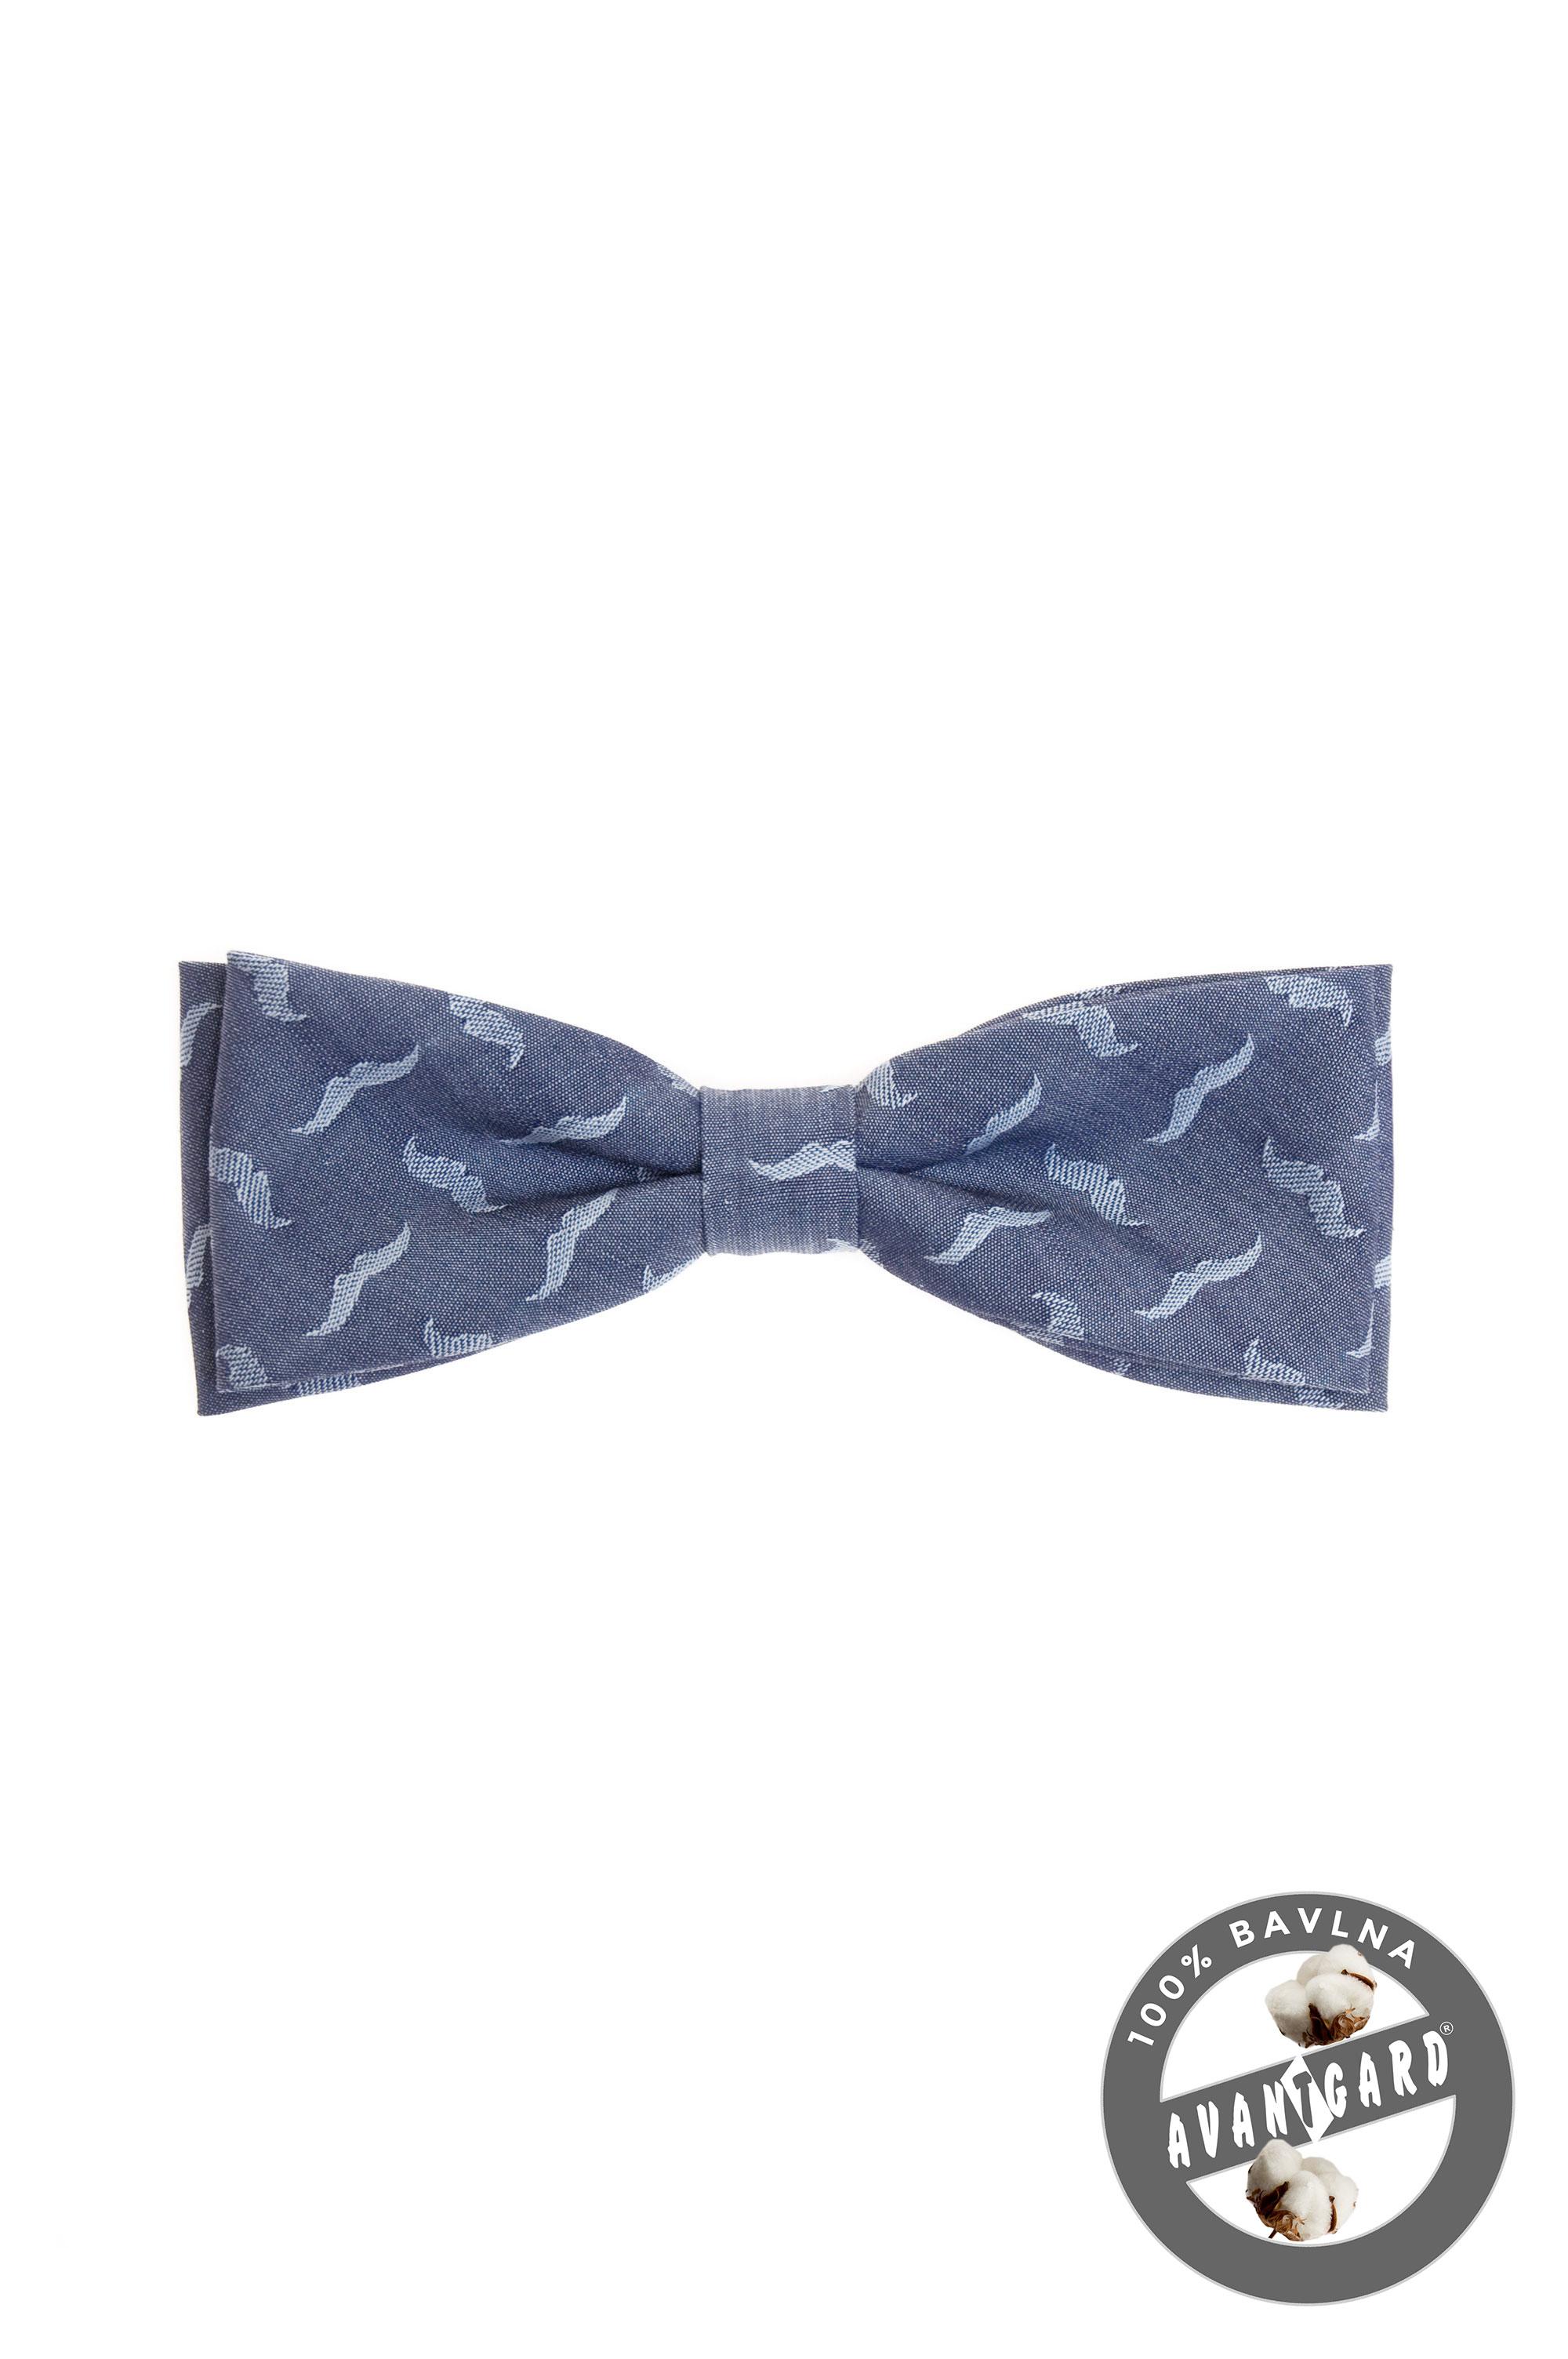 Avantgard pánský motýlek Klasik 576 5075 Modrá